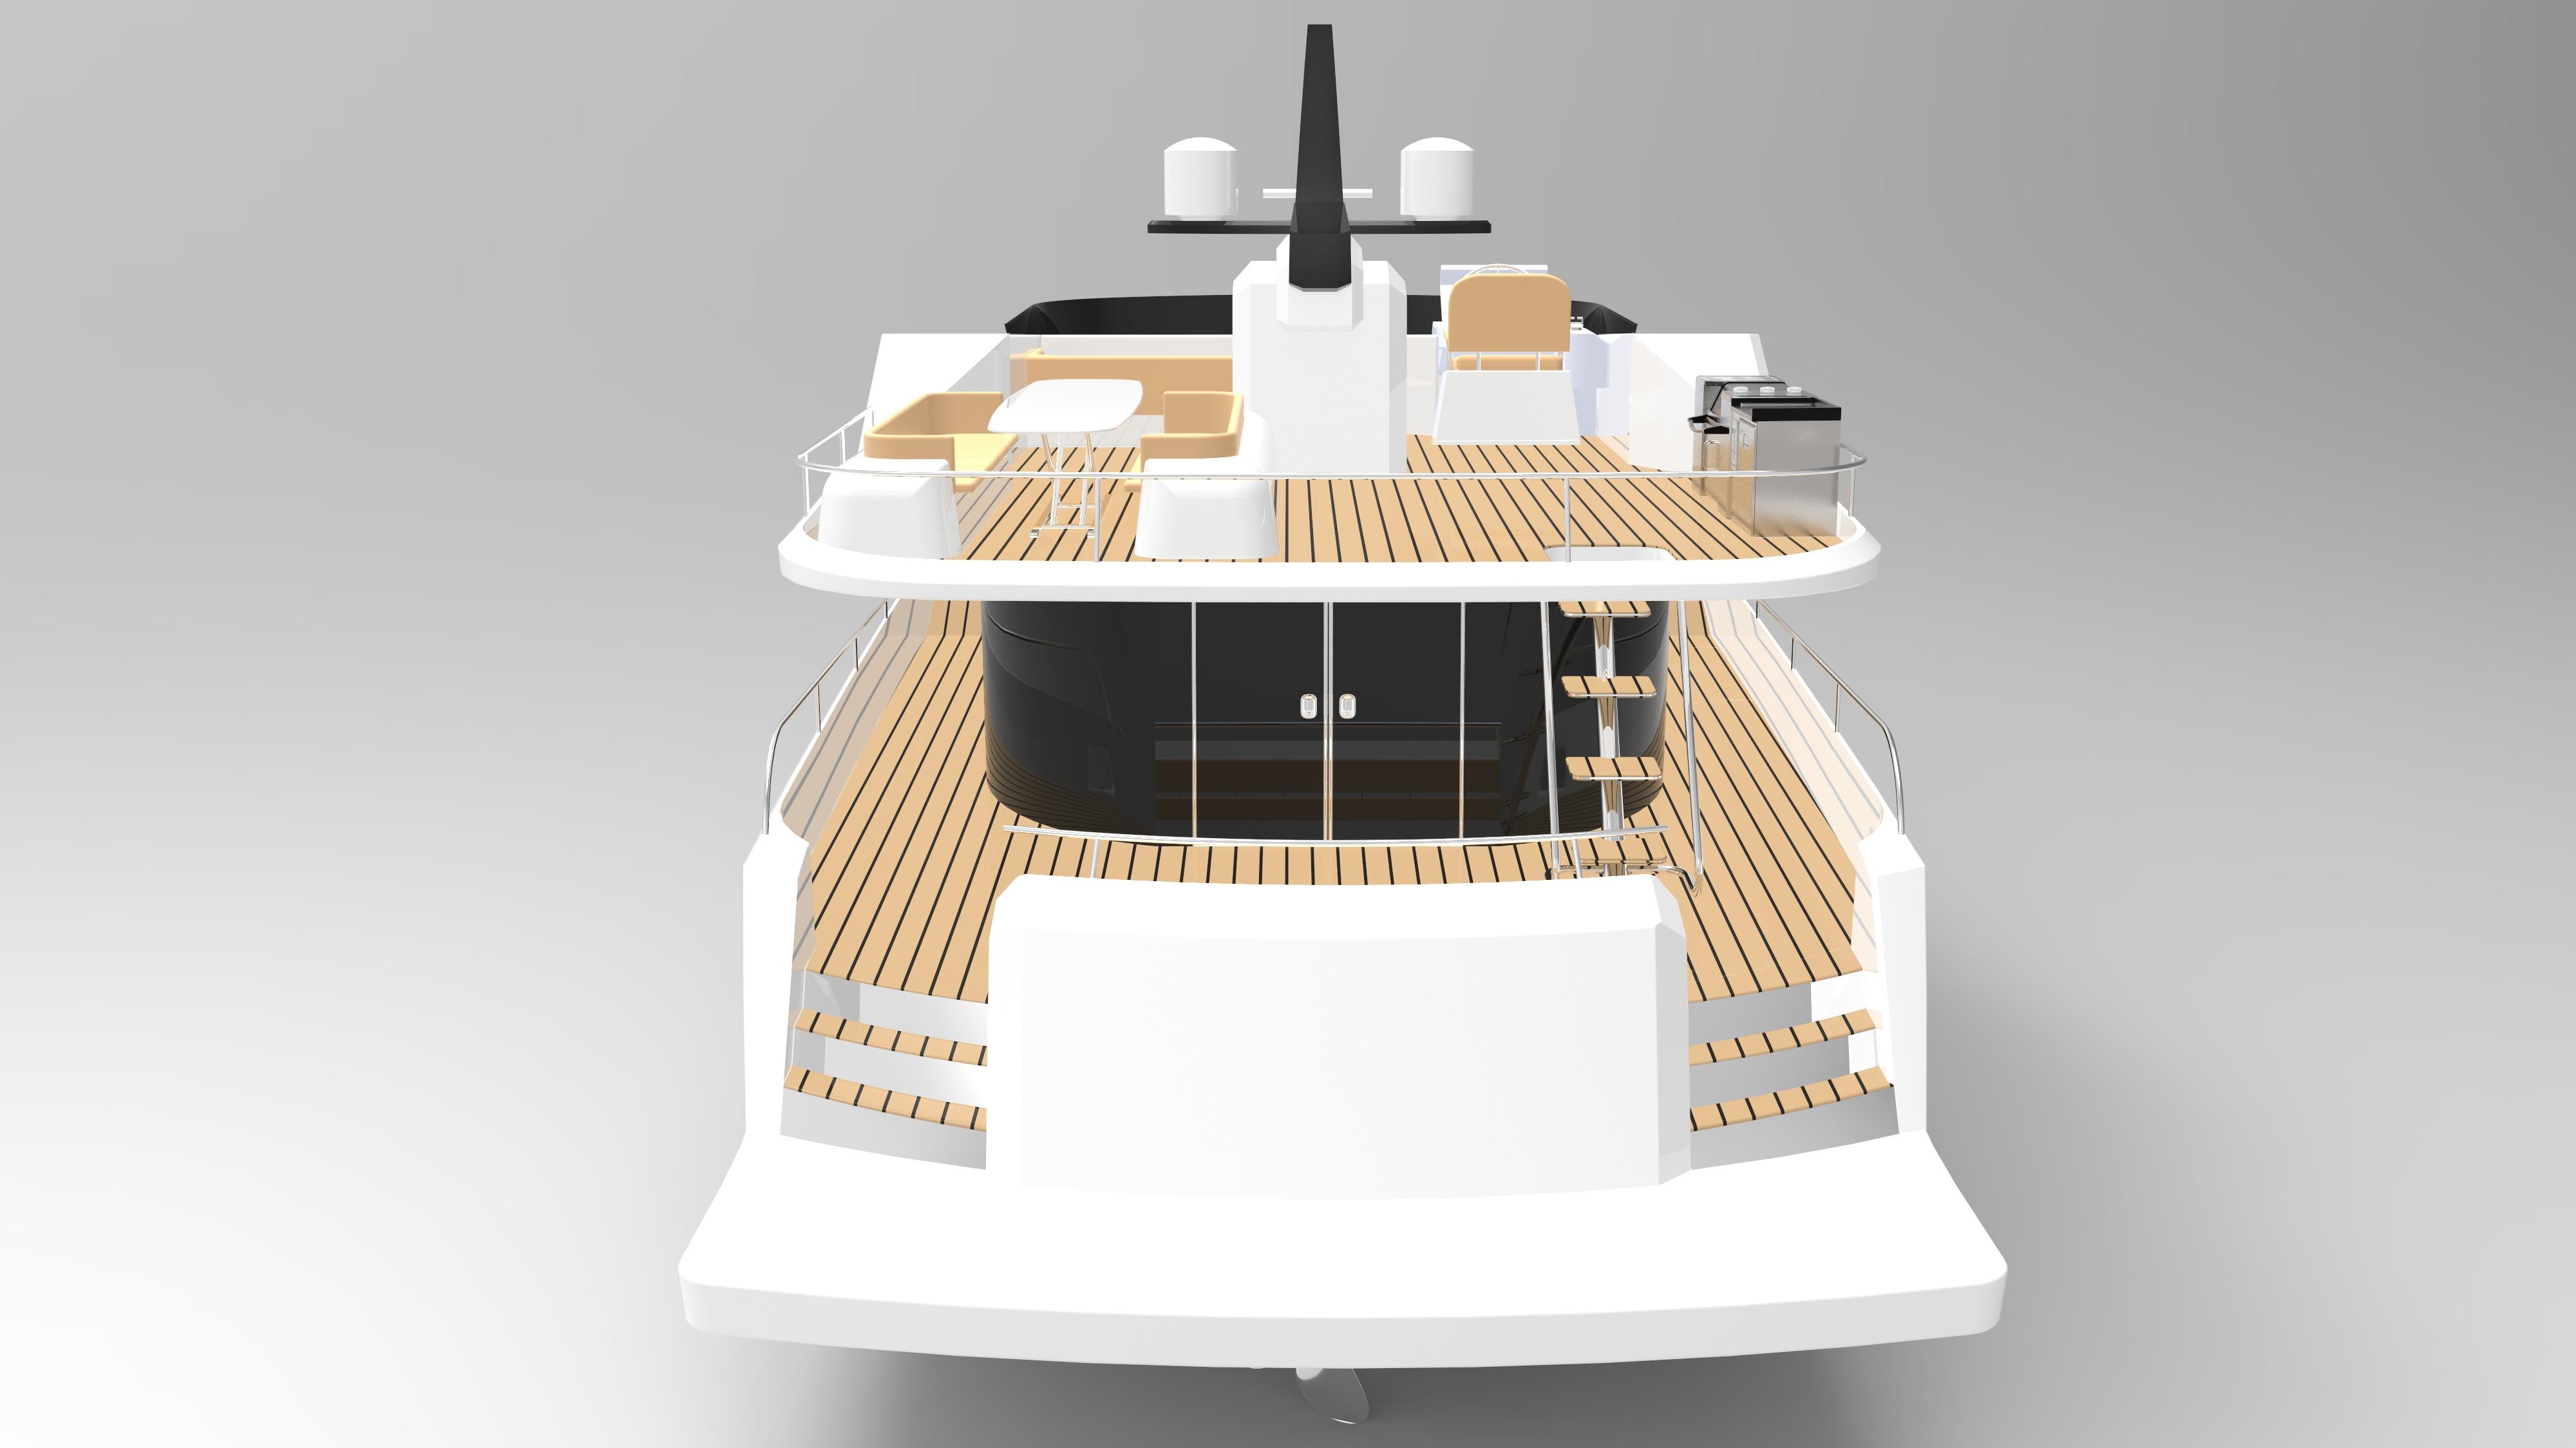 Boat1.36.jpg